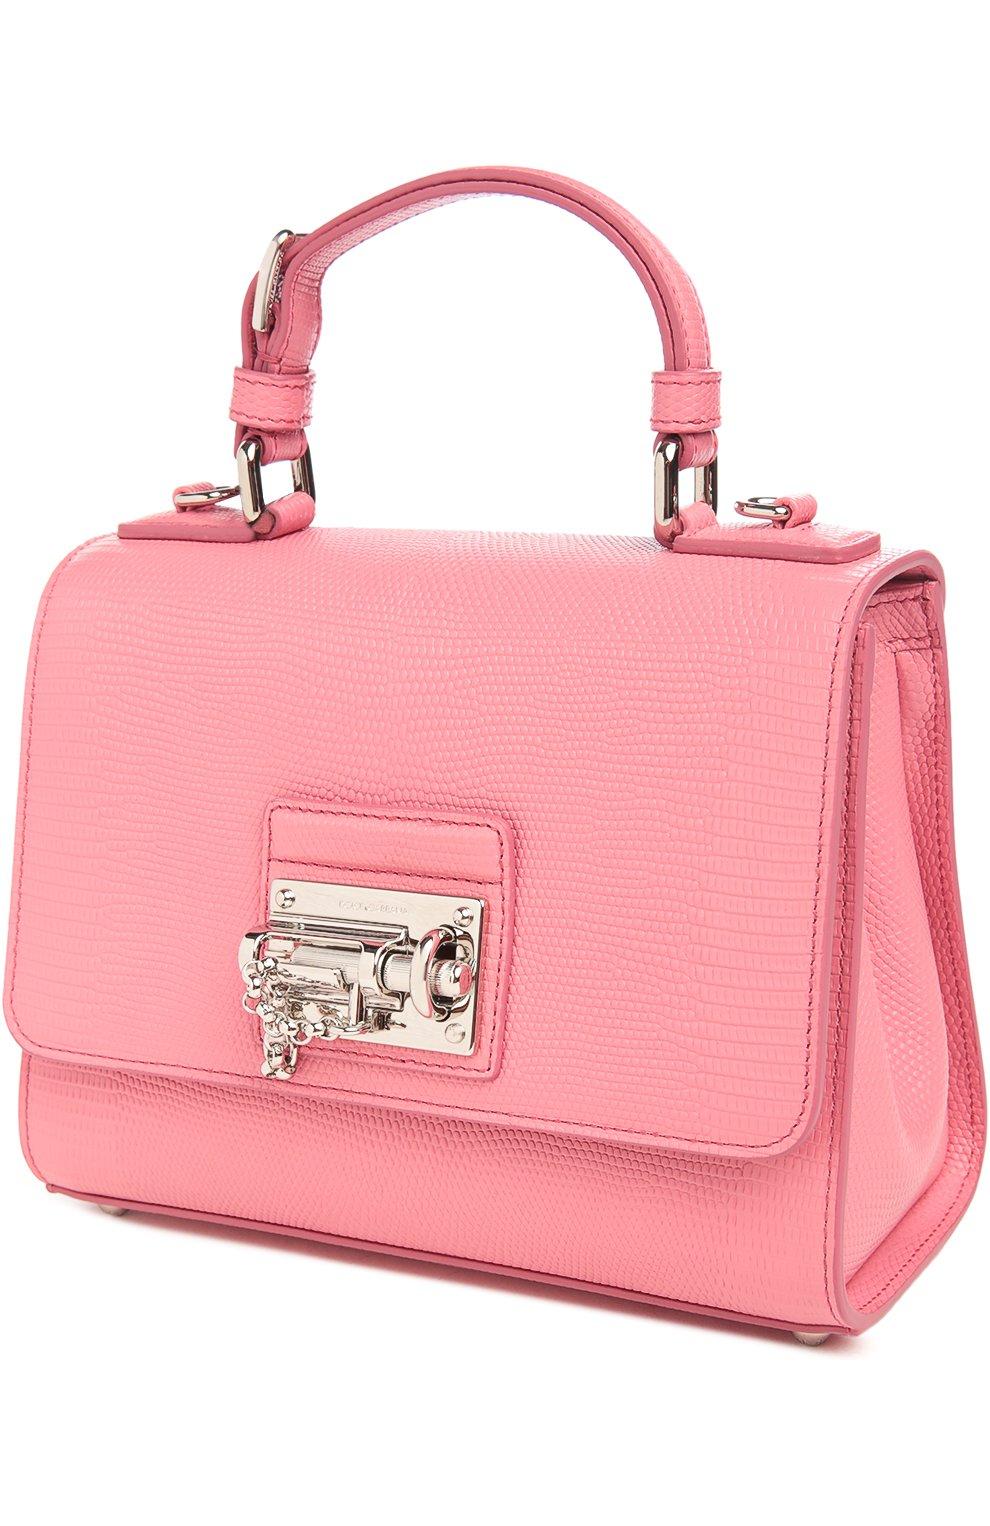 Сумка Monica с зеркалом Dolce & Gabbana светло-розовая цвета | Фото №3